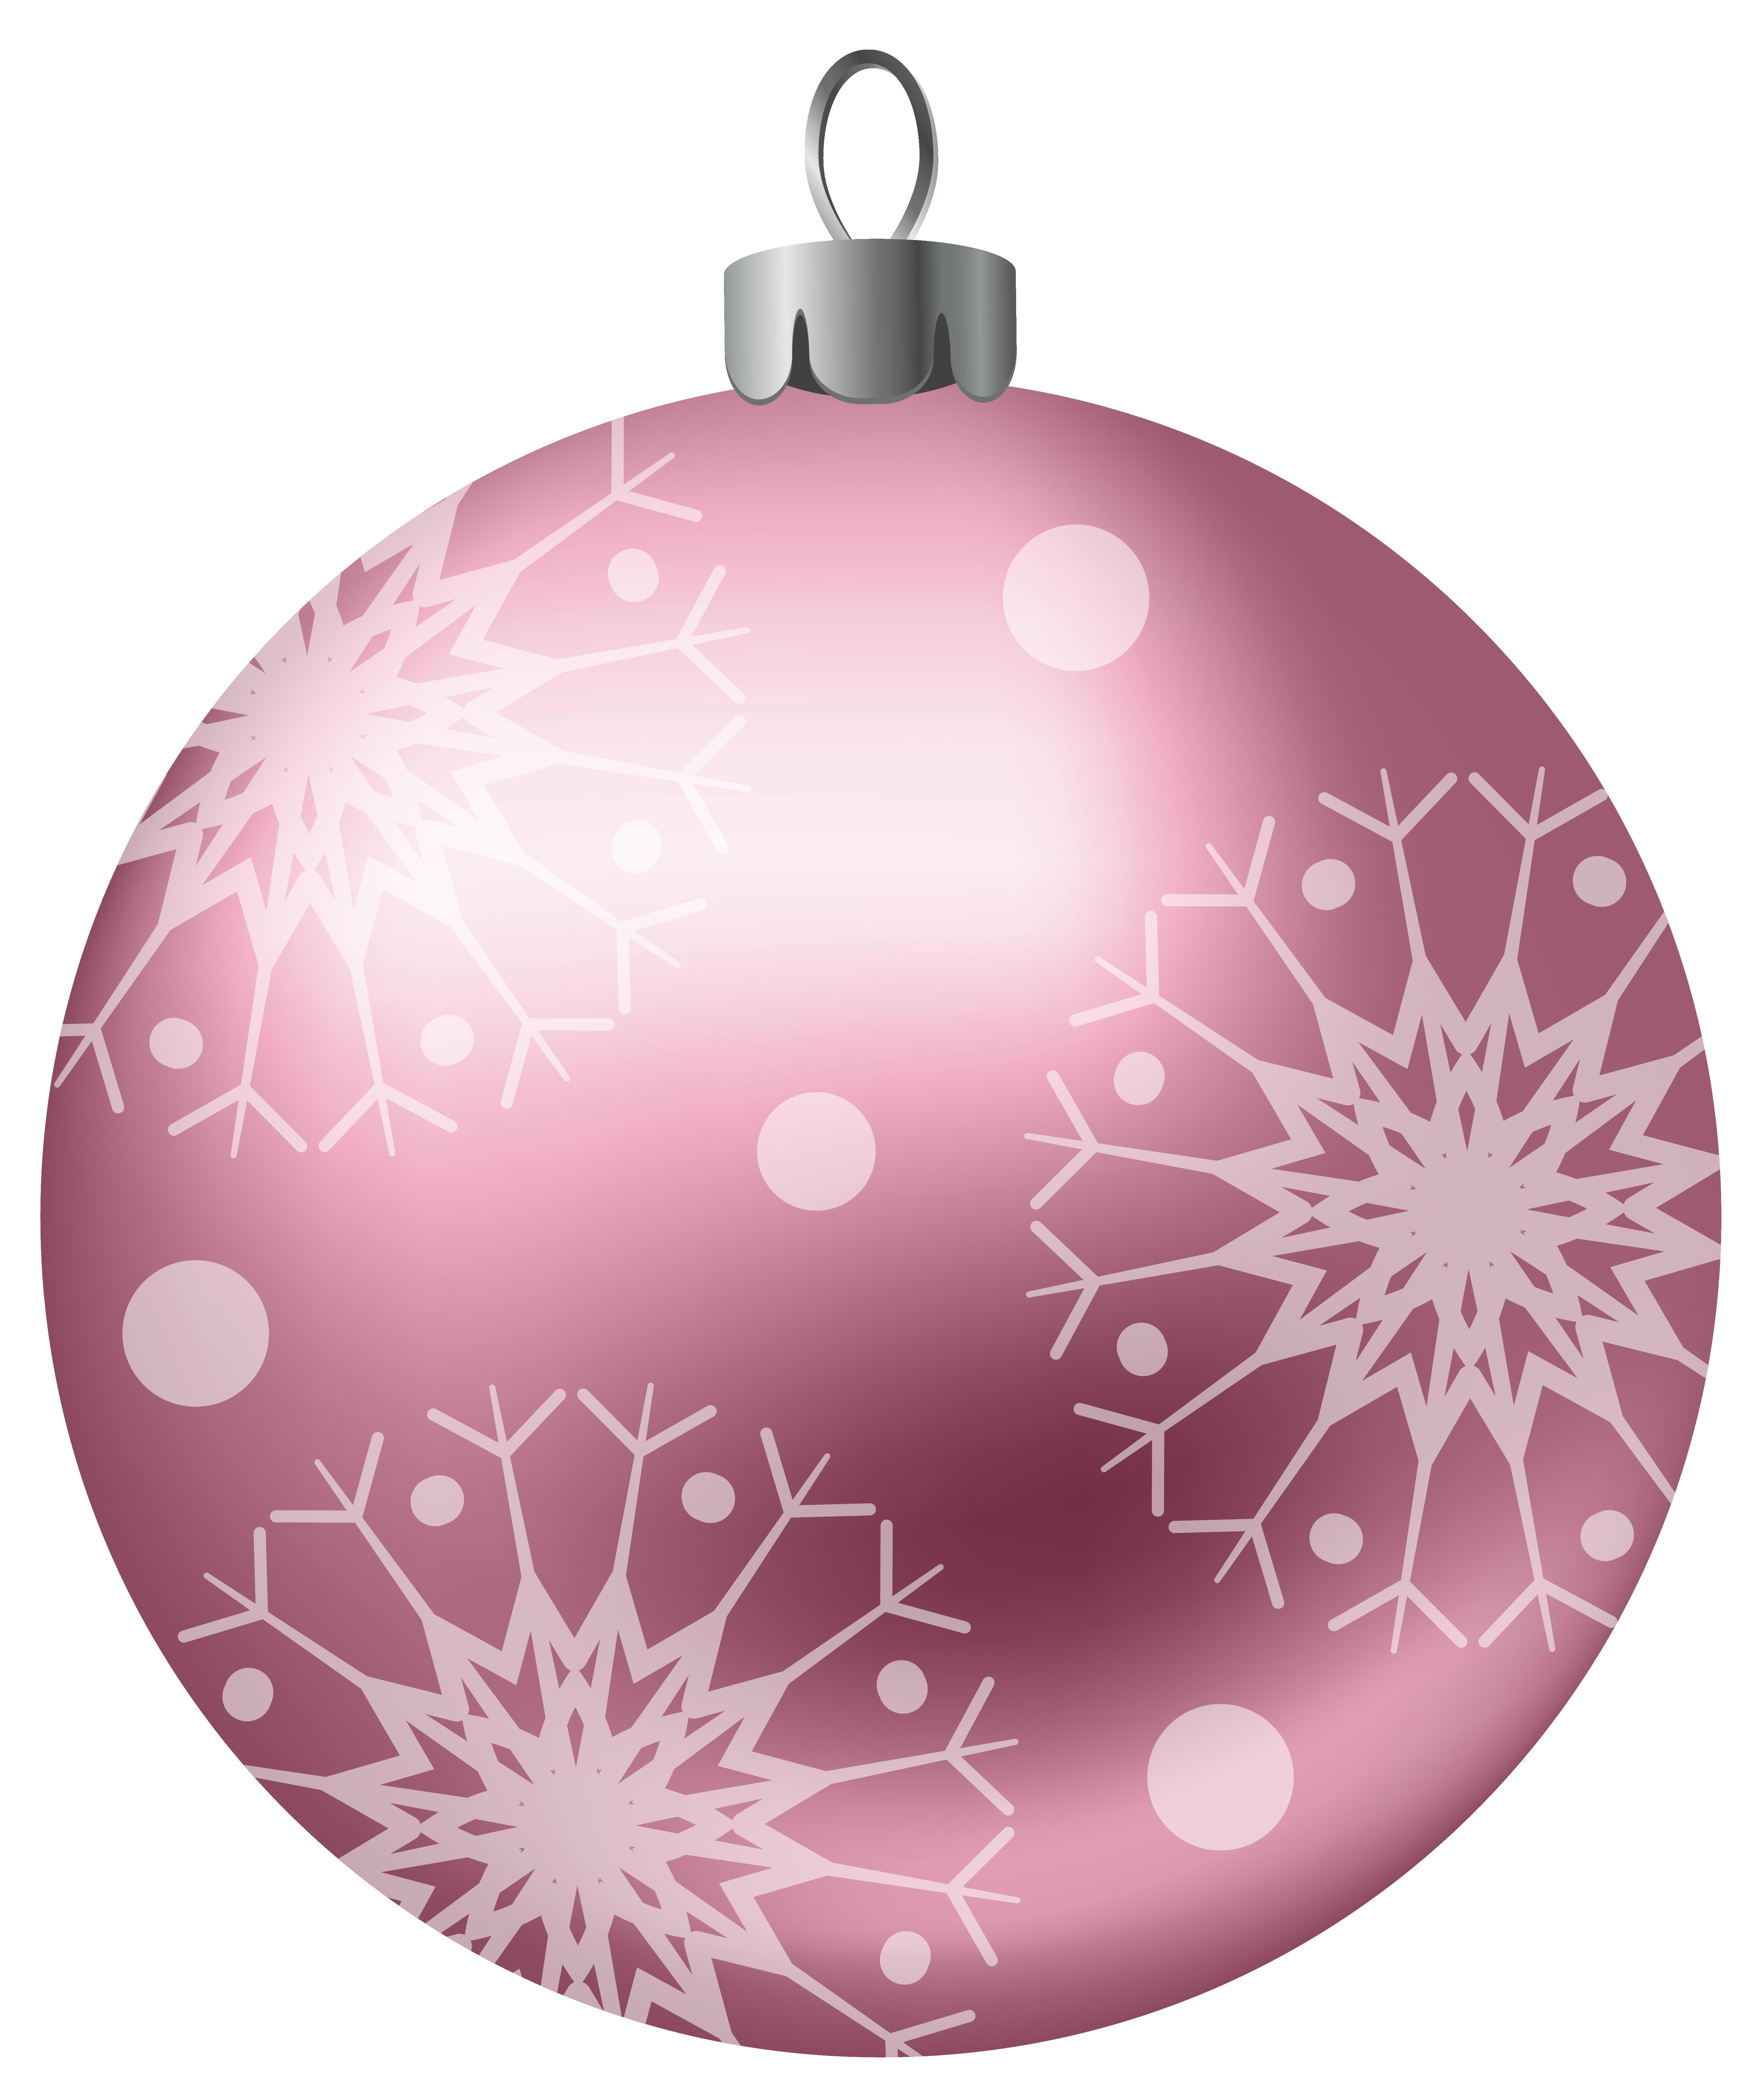 Christmas Ball Pink Png Clipart Image Christmas Balls Christmas Stickers Christmas